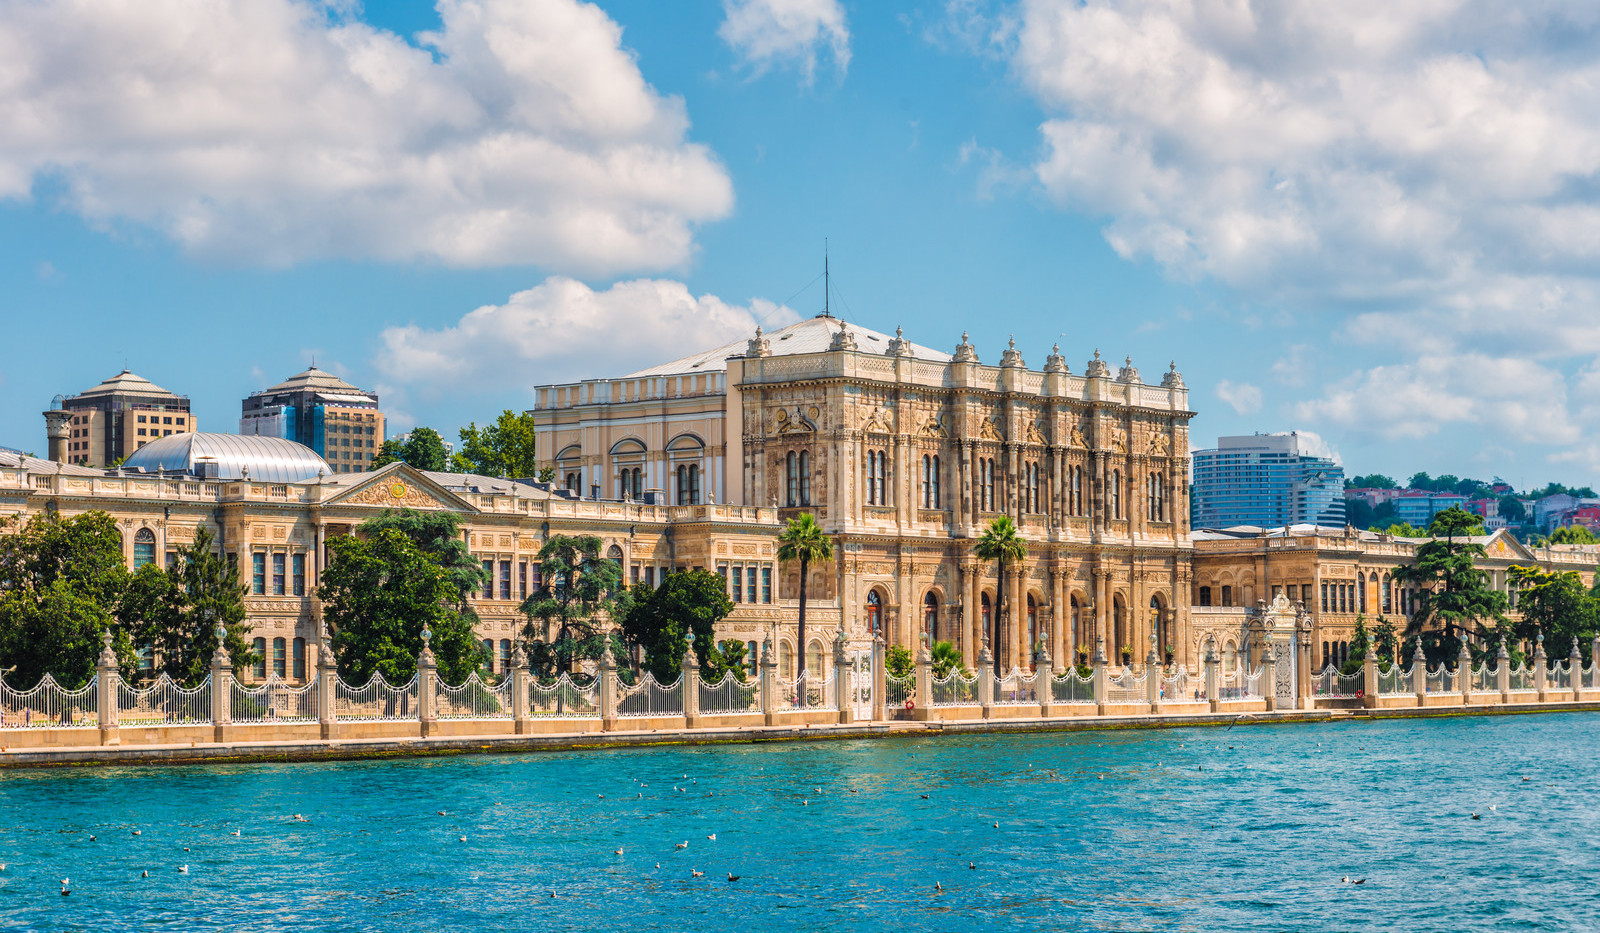 Canva - Dolmabahce Palace.jpg